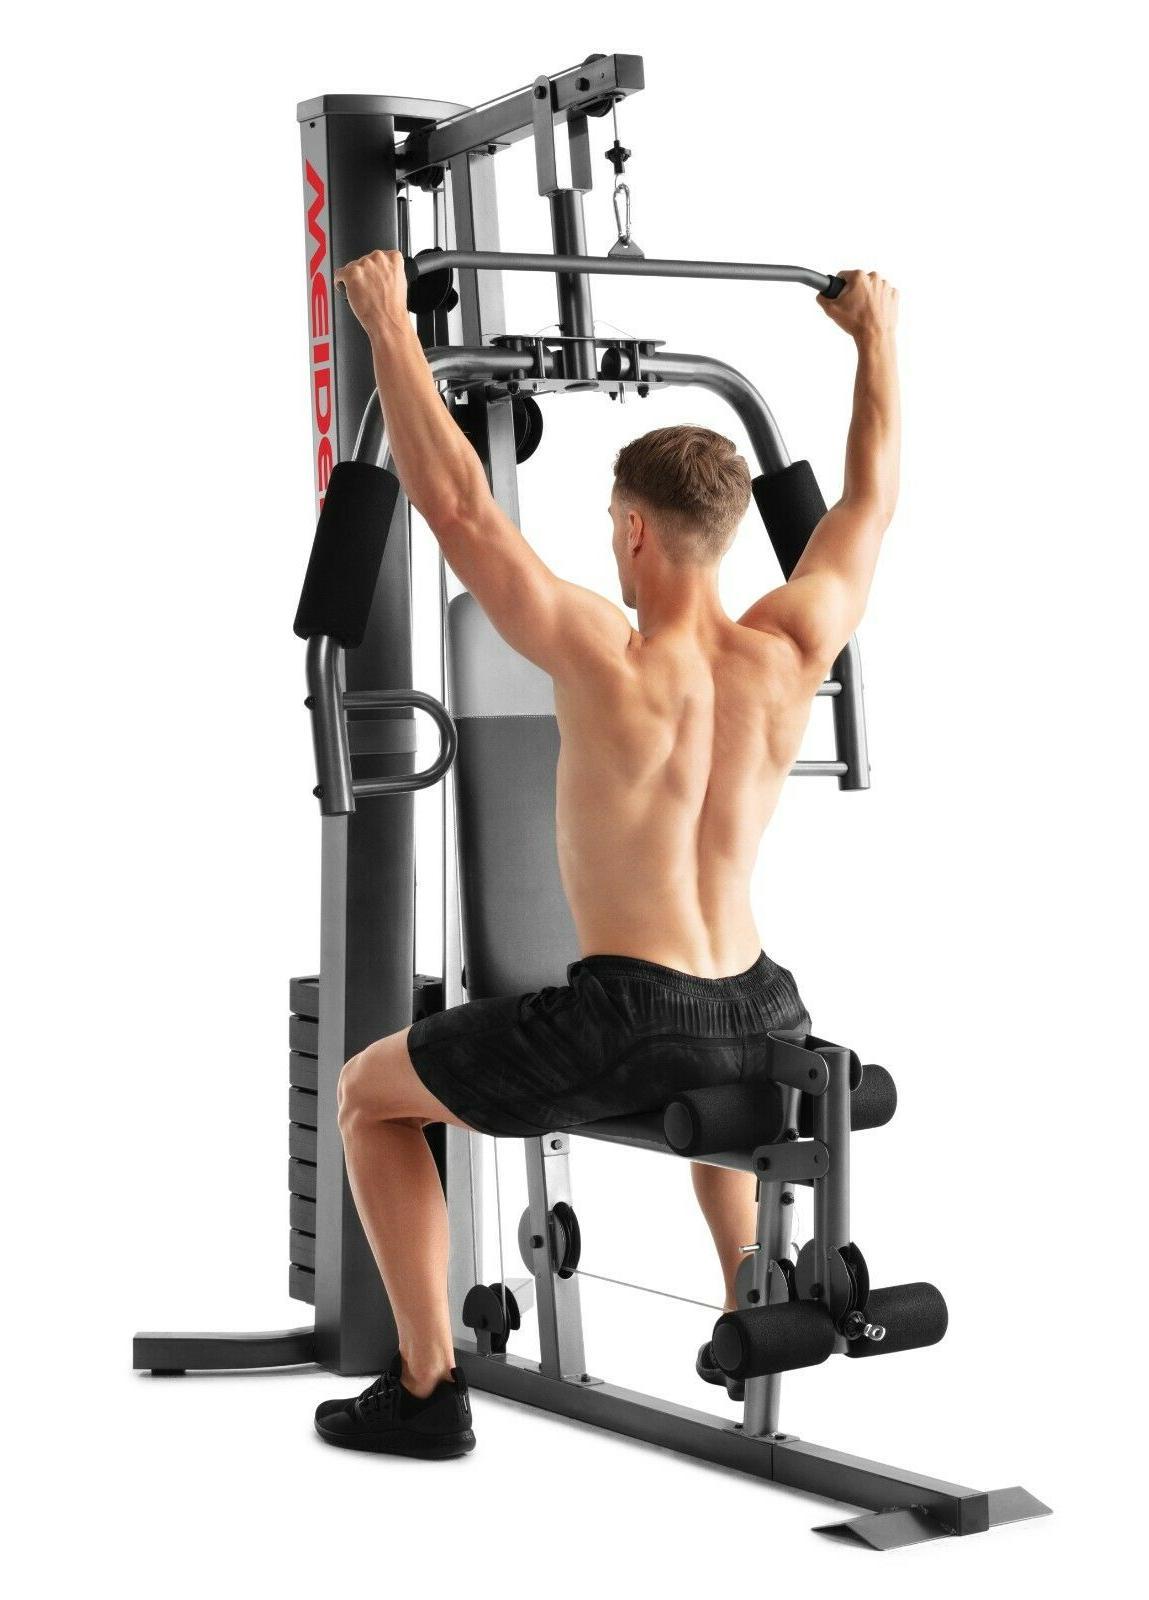 Home Gym Equipment Training Machine Workout